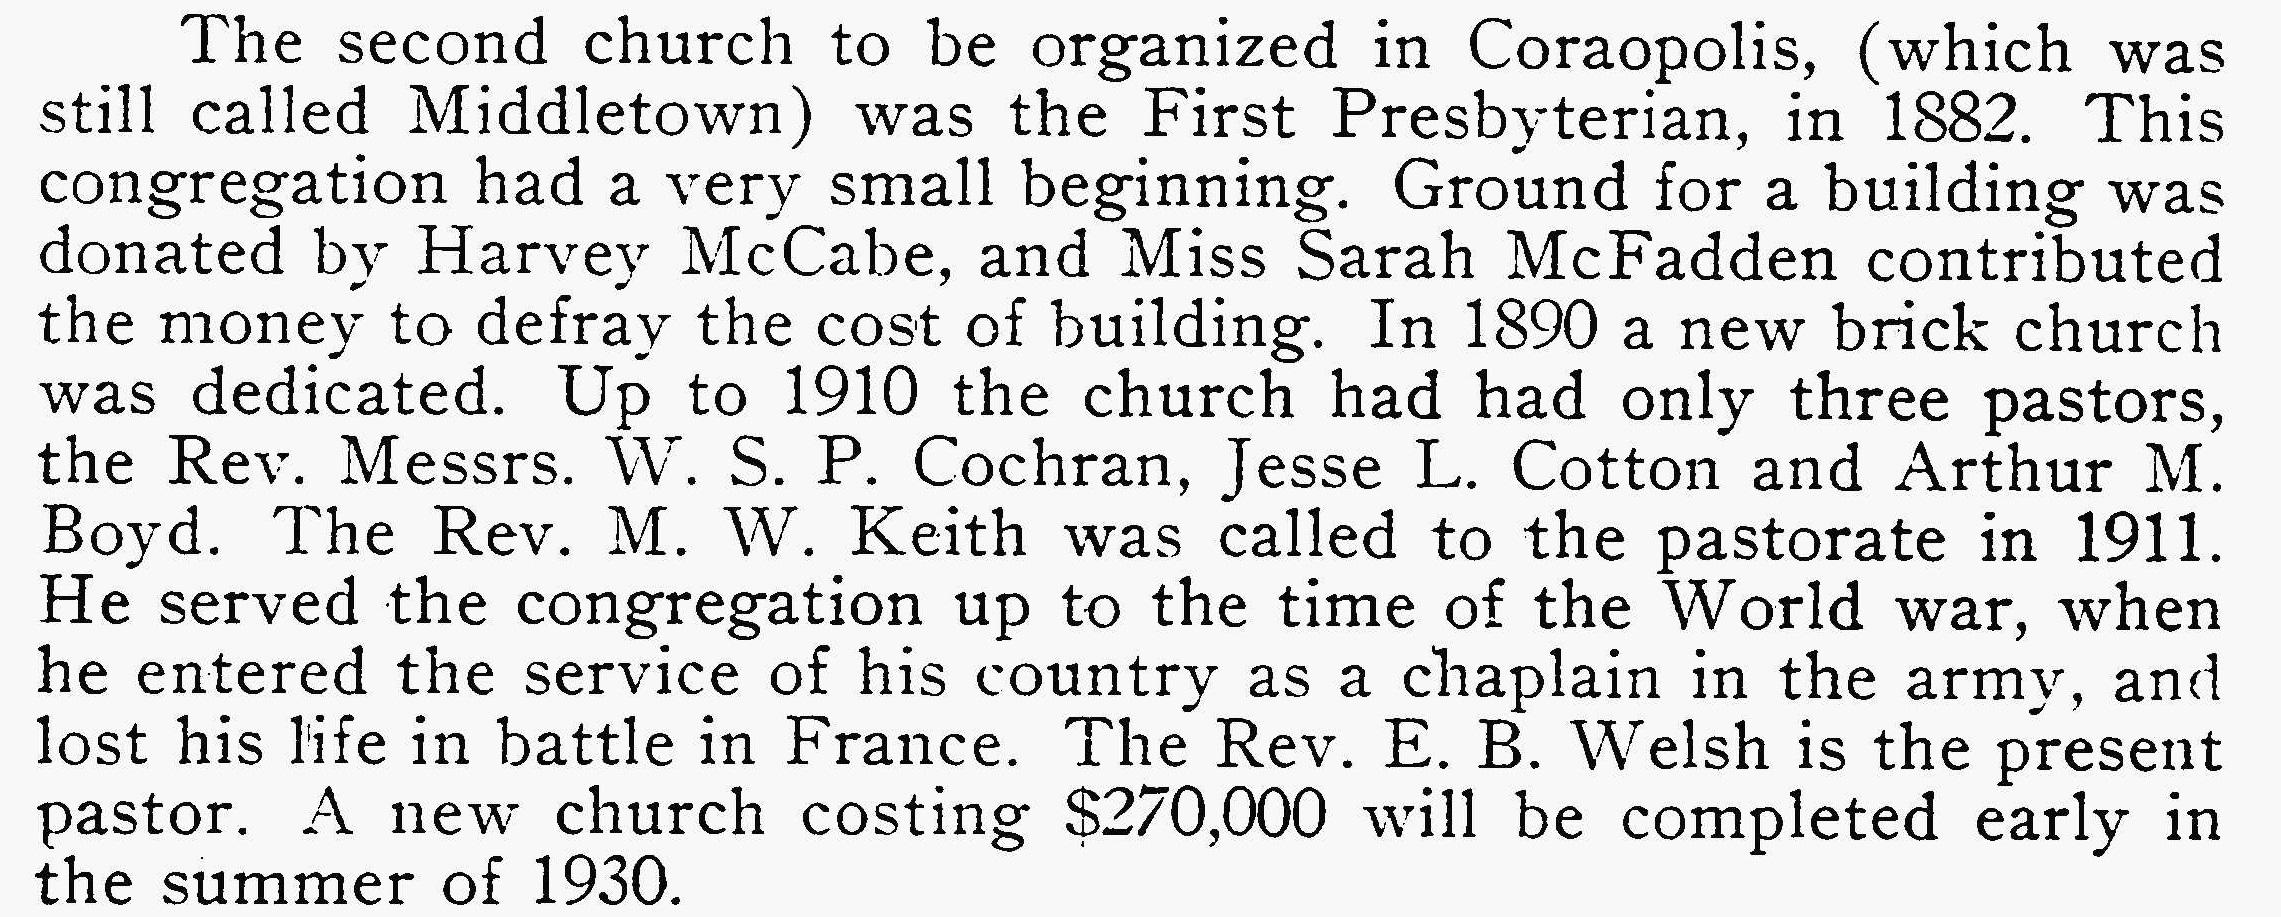 The First Presbyterian Church - Edward S Maurey - Where the West Began (pg63).jpg